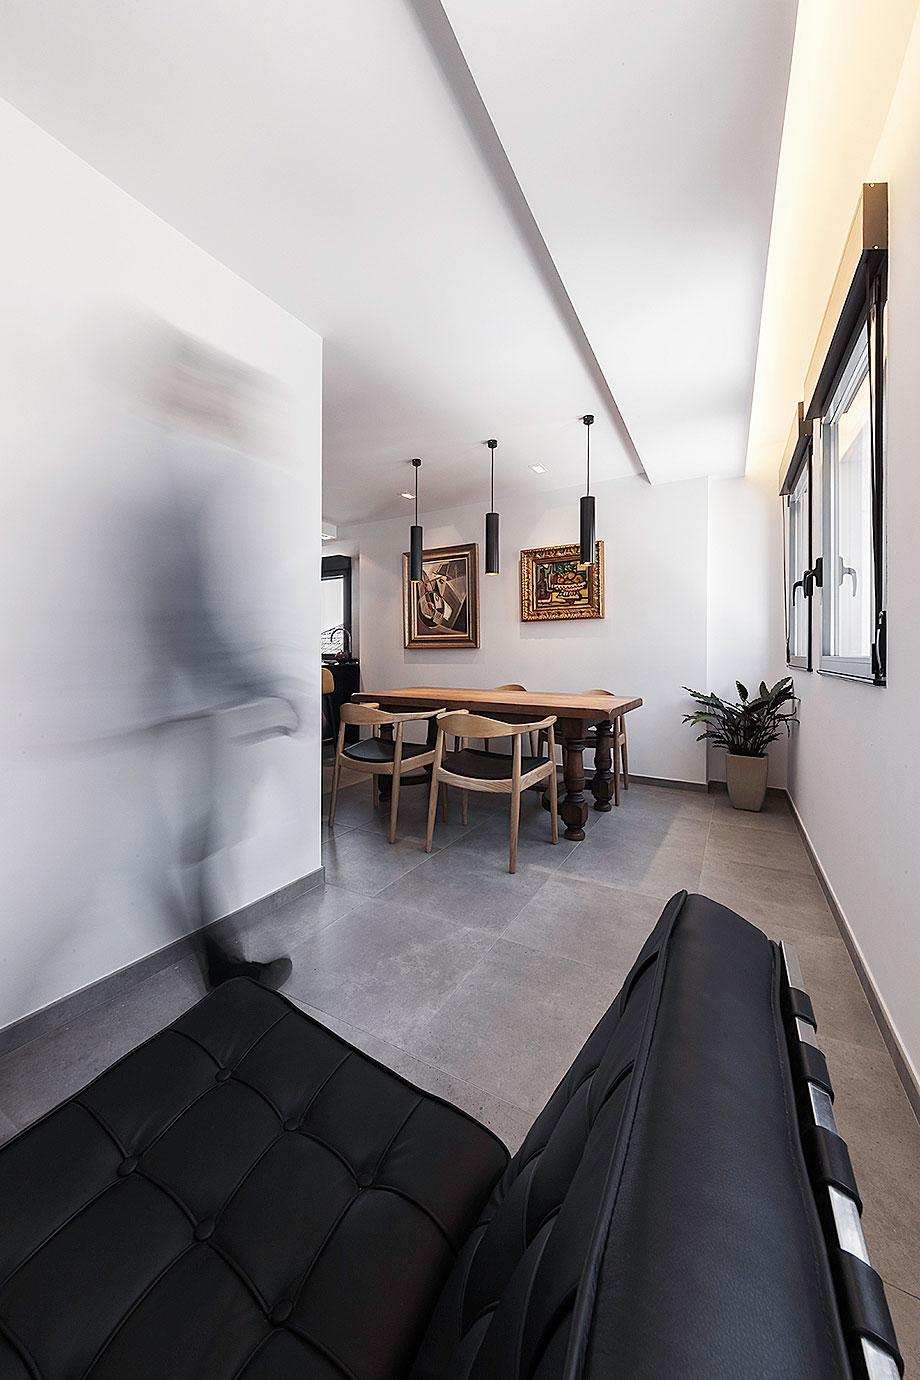 vivienda-nan-arquitectos-8